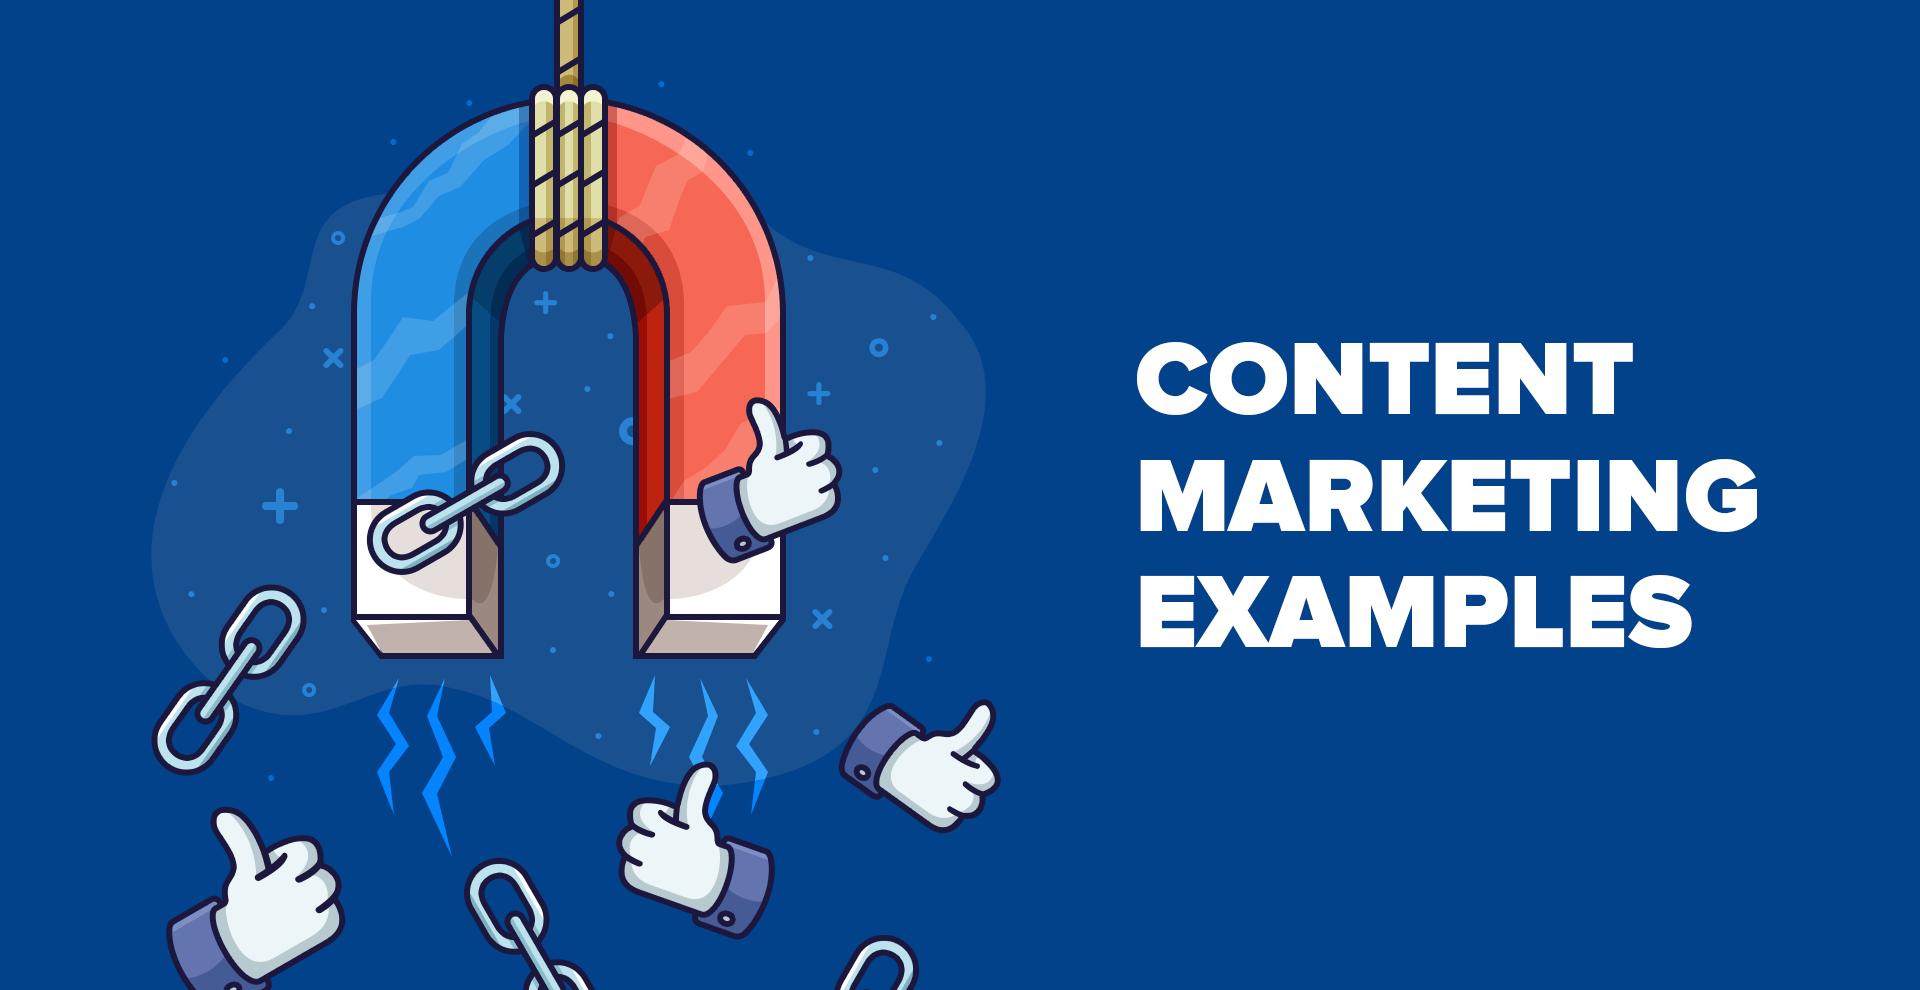 7 exemples de marketing de contenu inspirants (et comment les reproduire)